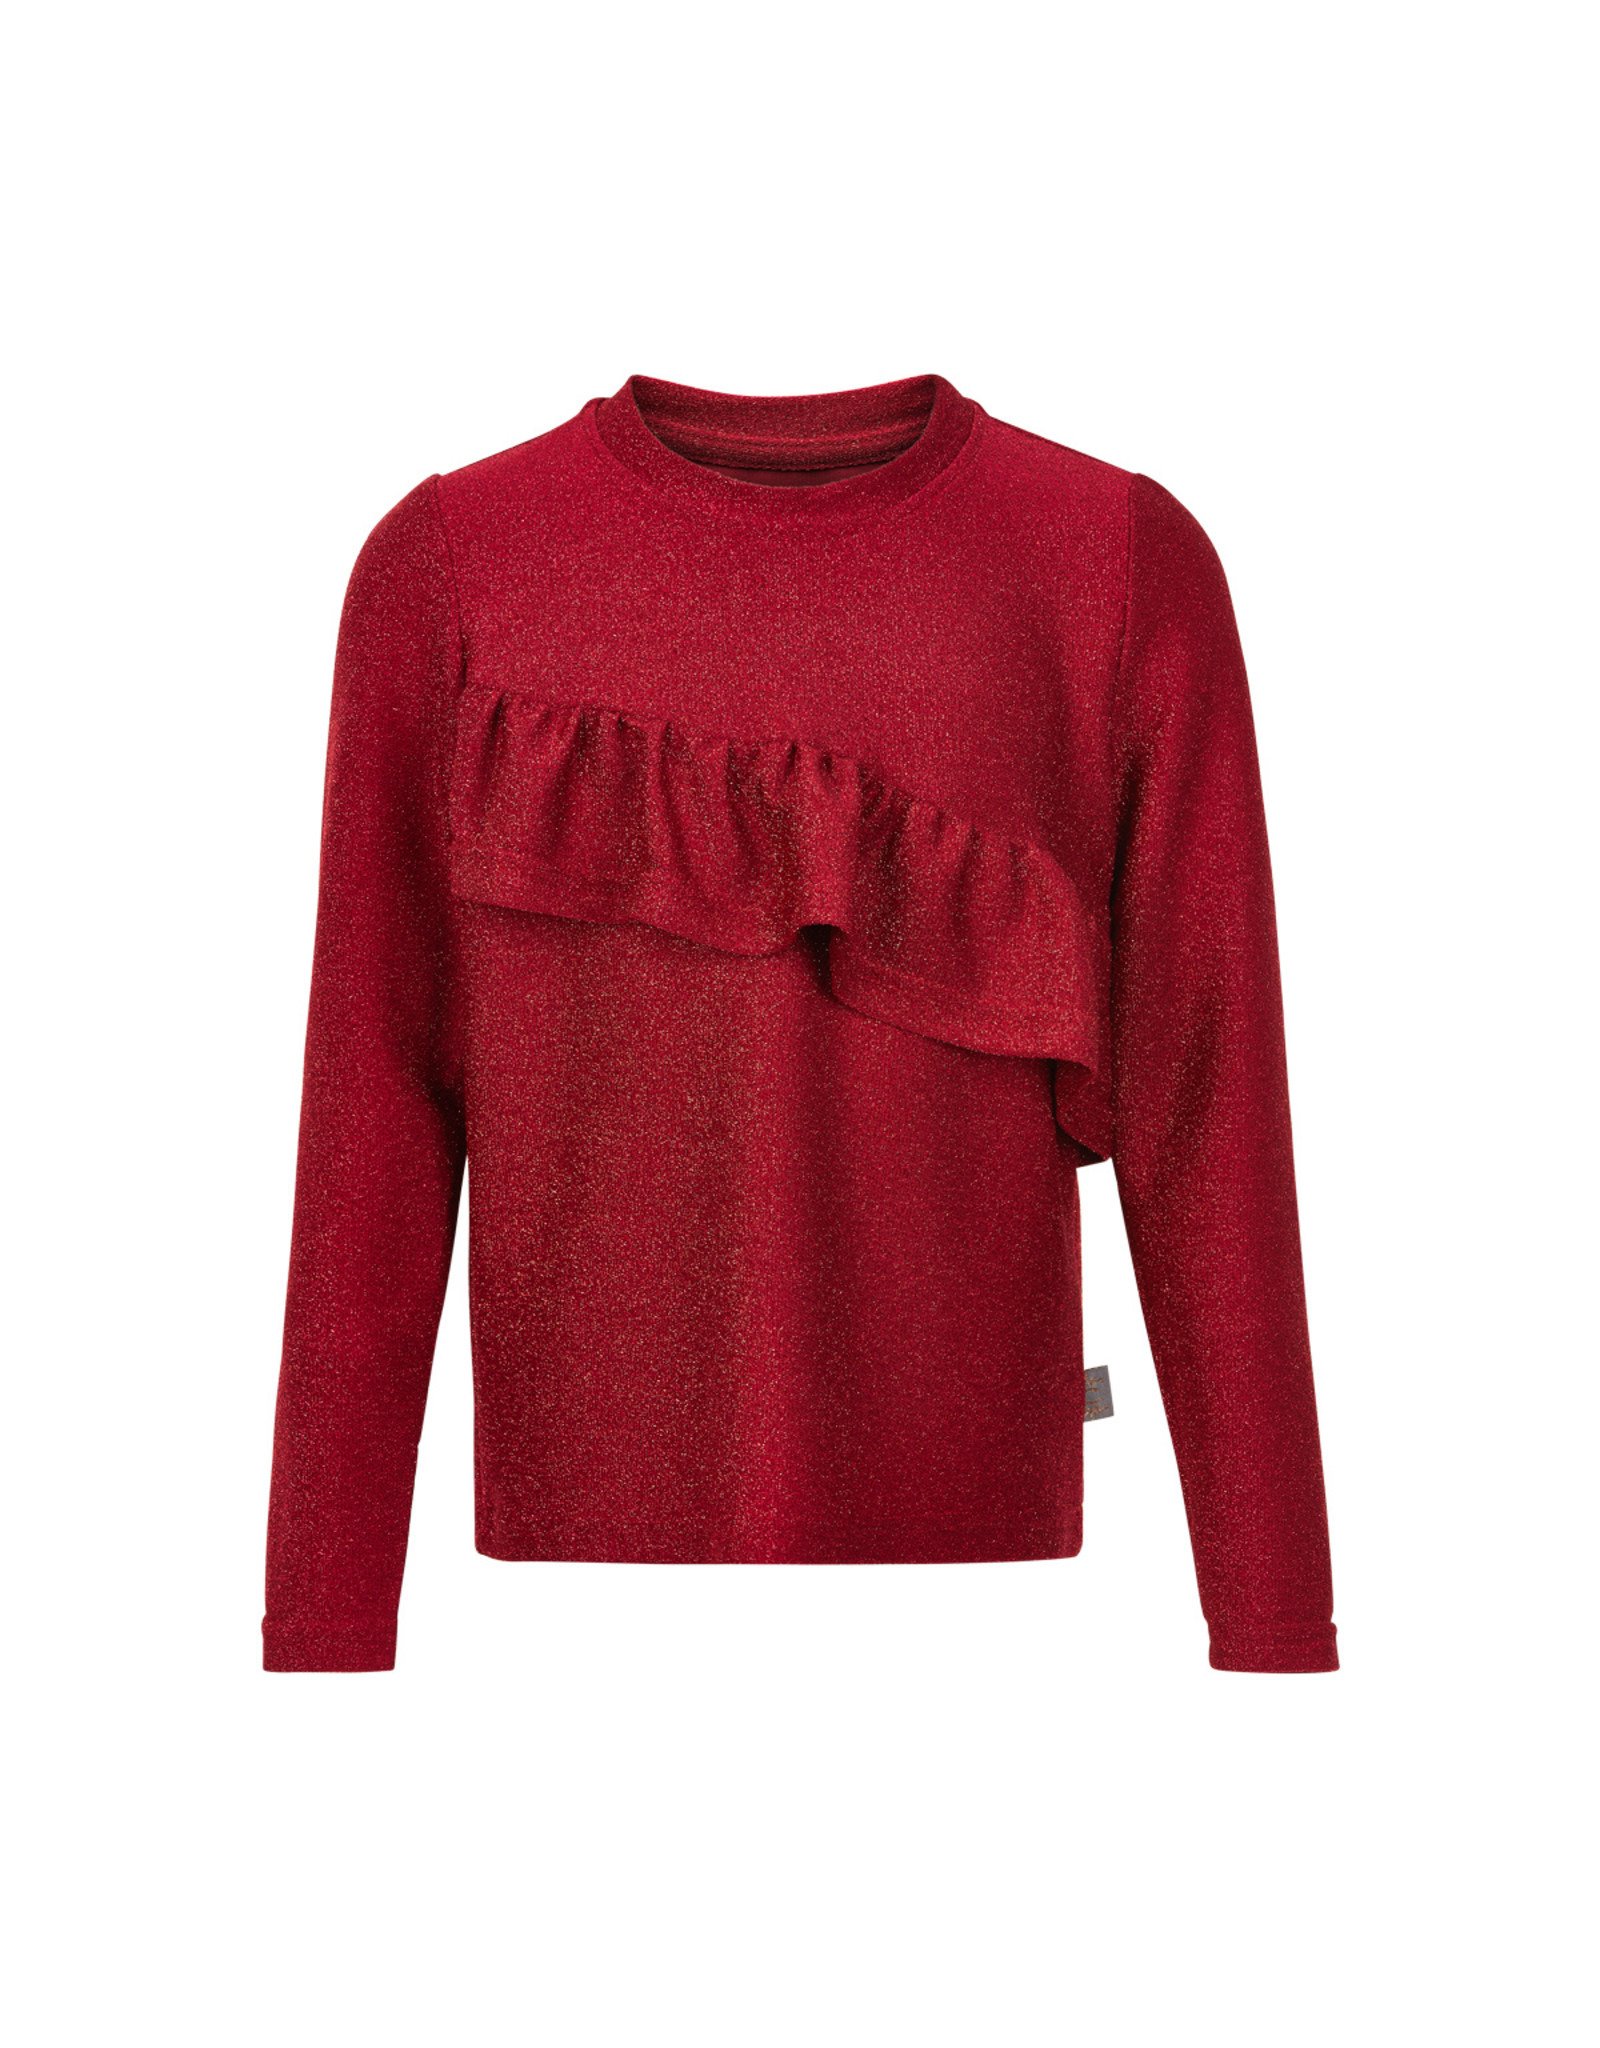 Creamie Creamie T-shirt Glitter Jersey Longsleeve Crimson